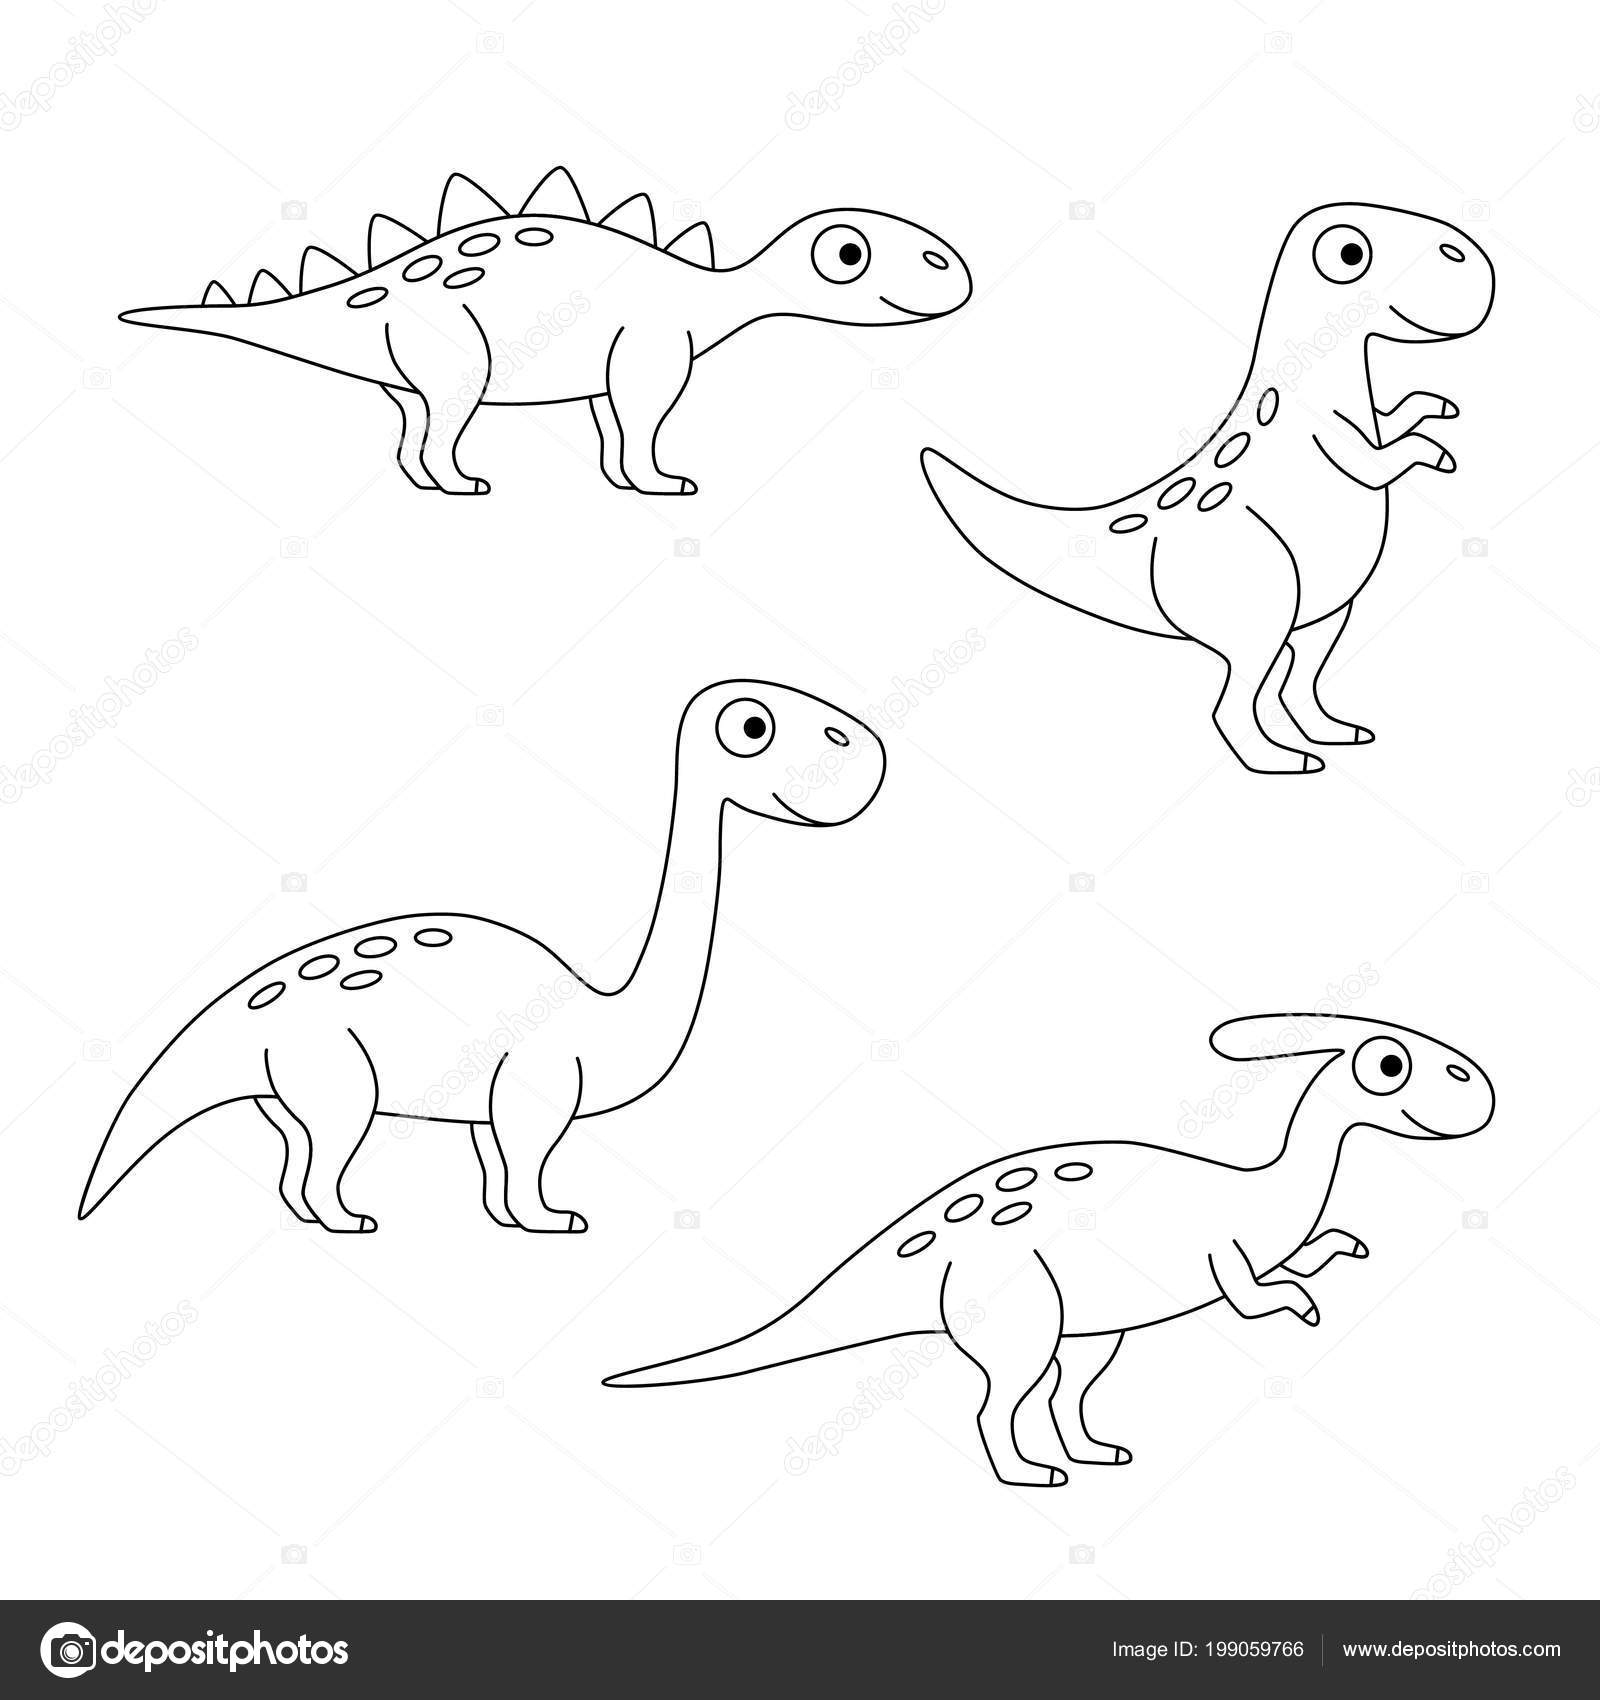 Image of: Prehistoric Vector Illustration Of Extinct Animals Tyrannosaurus Rex Brachiosaurus Stegosaurus Parasaurolophus Stock Illustration Boys Life Magazine Black White Set Dinosaurs Vector Illustration Extinct Animals